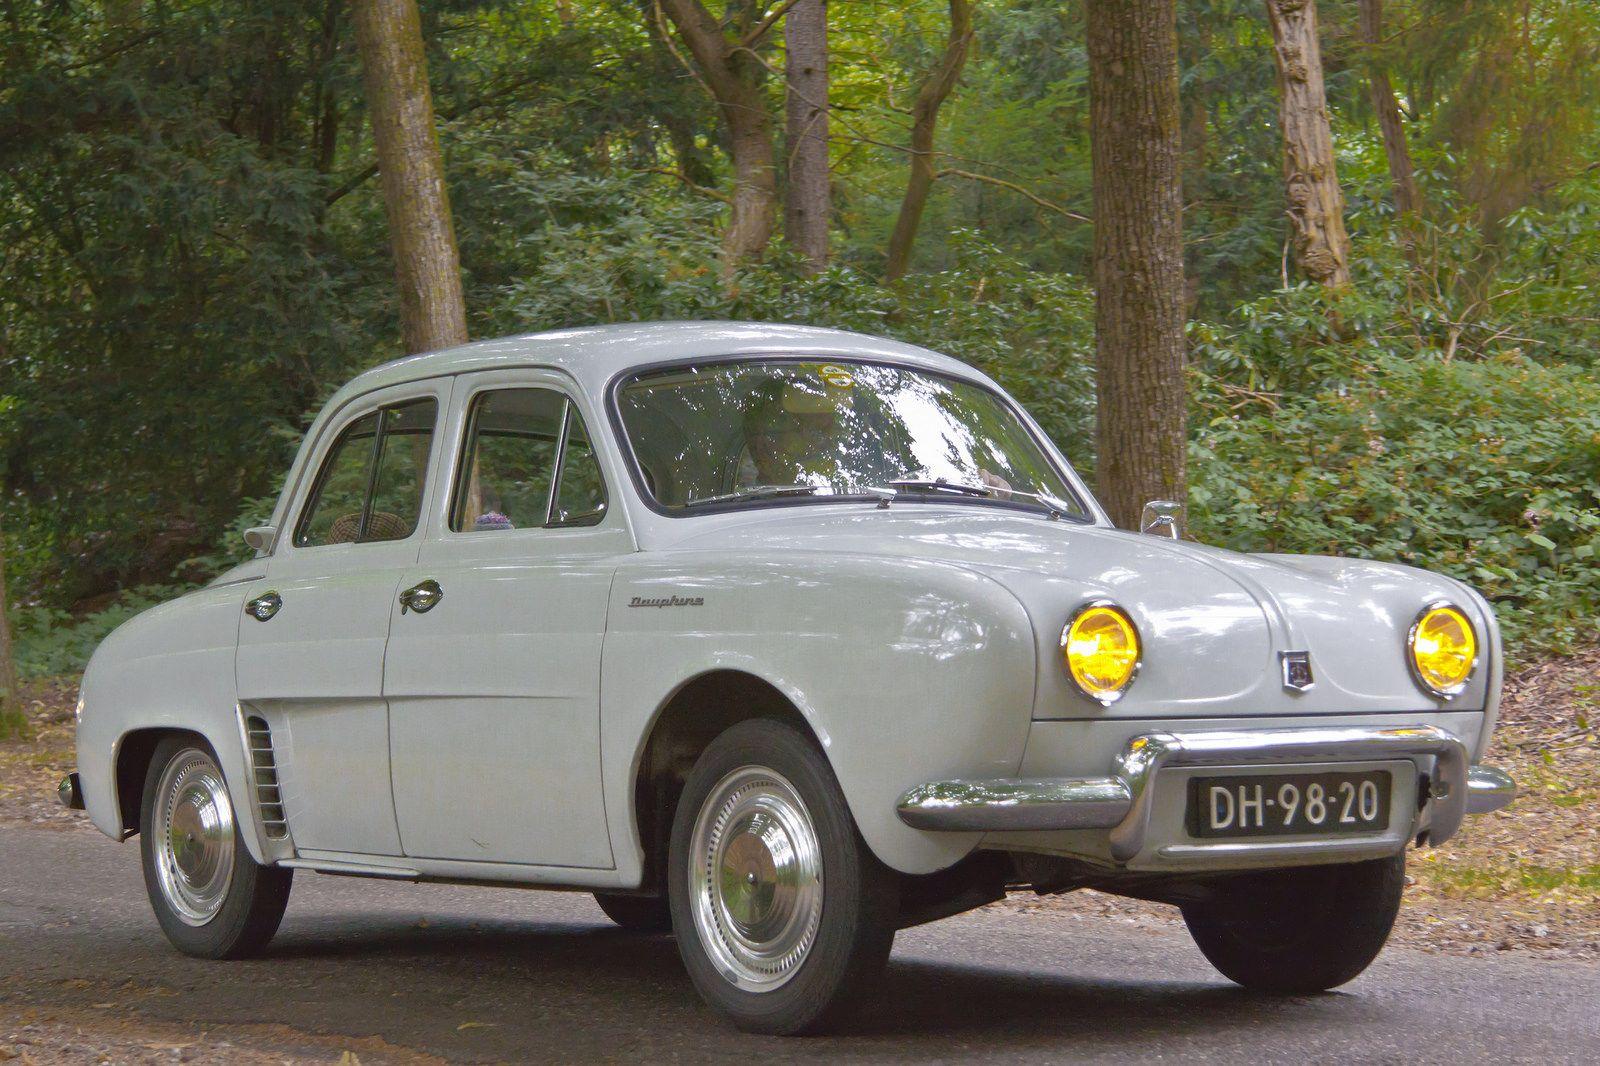 Renault Dauphine 1960 3565 Classic Cars Vintage Classic Cars Motor Car